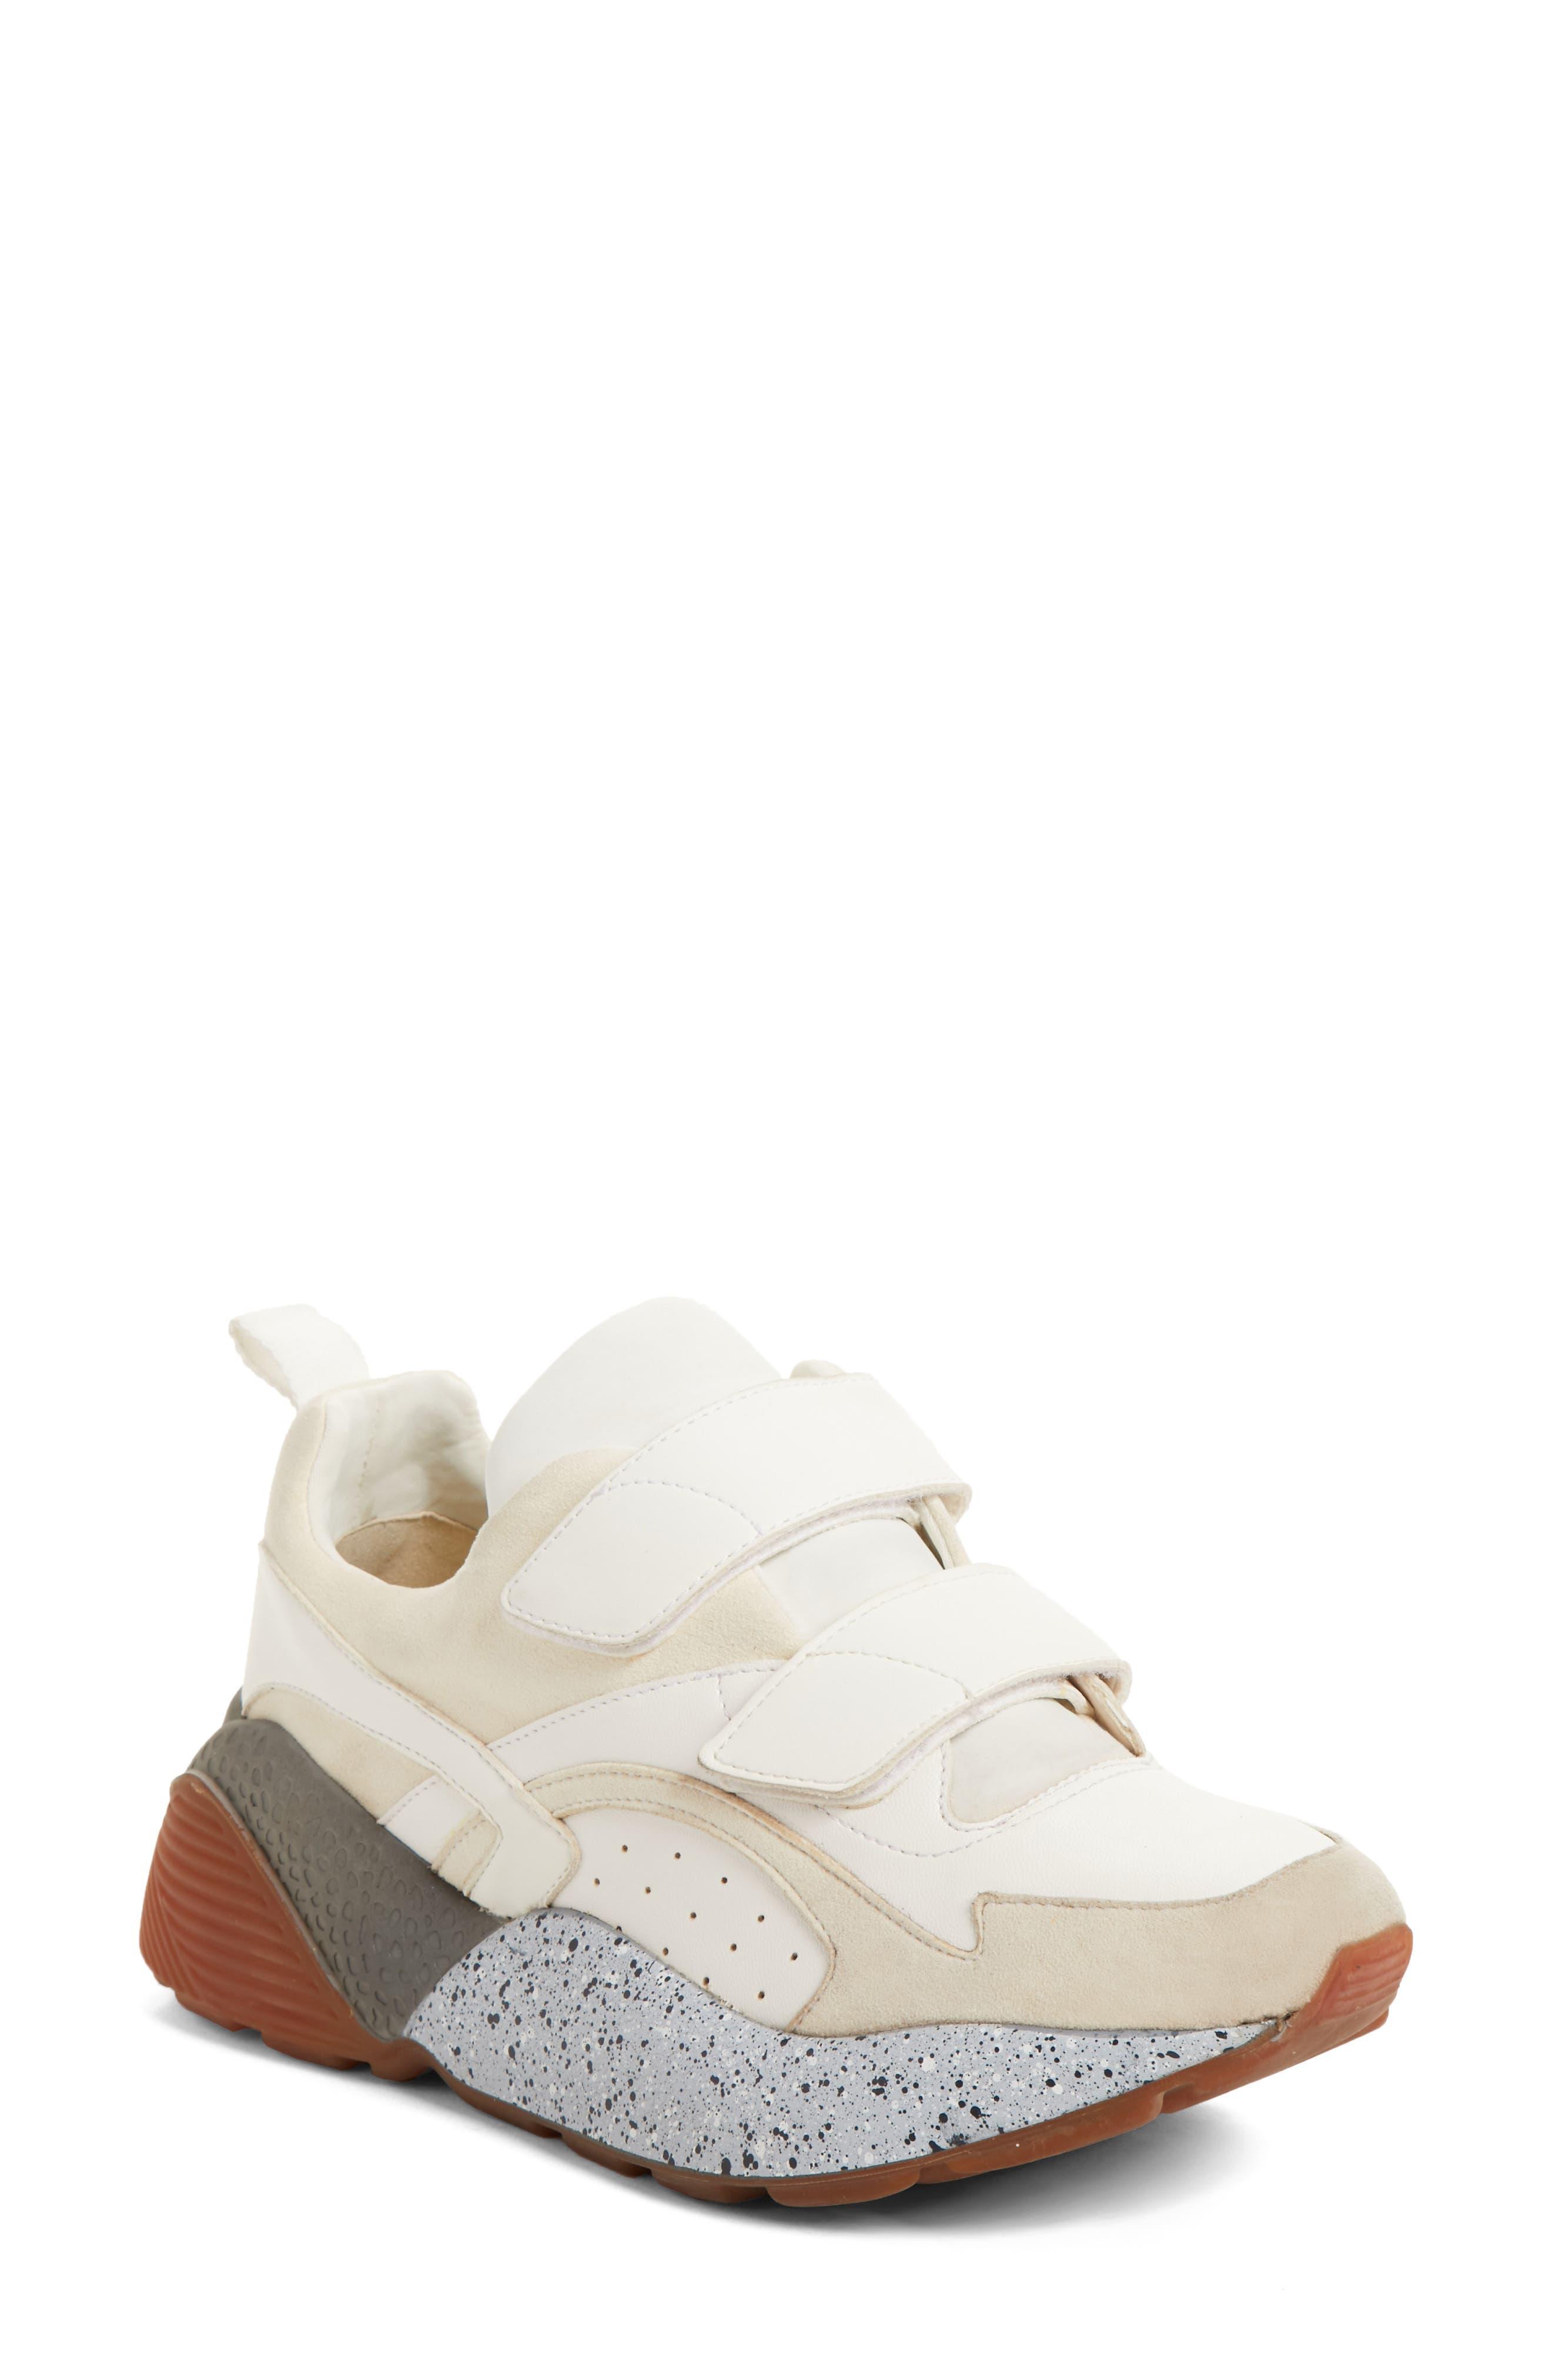 Alternate Image 1 Selected - Stella McCartney Platform Sneaker (Women)